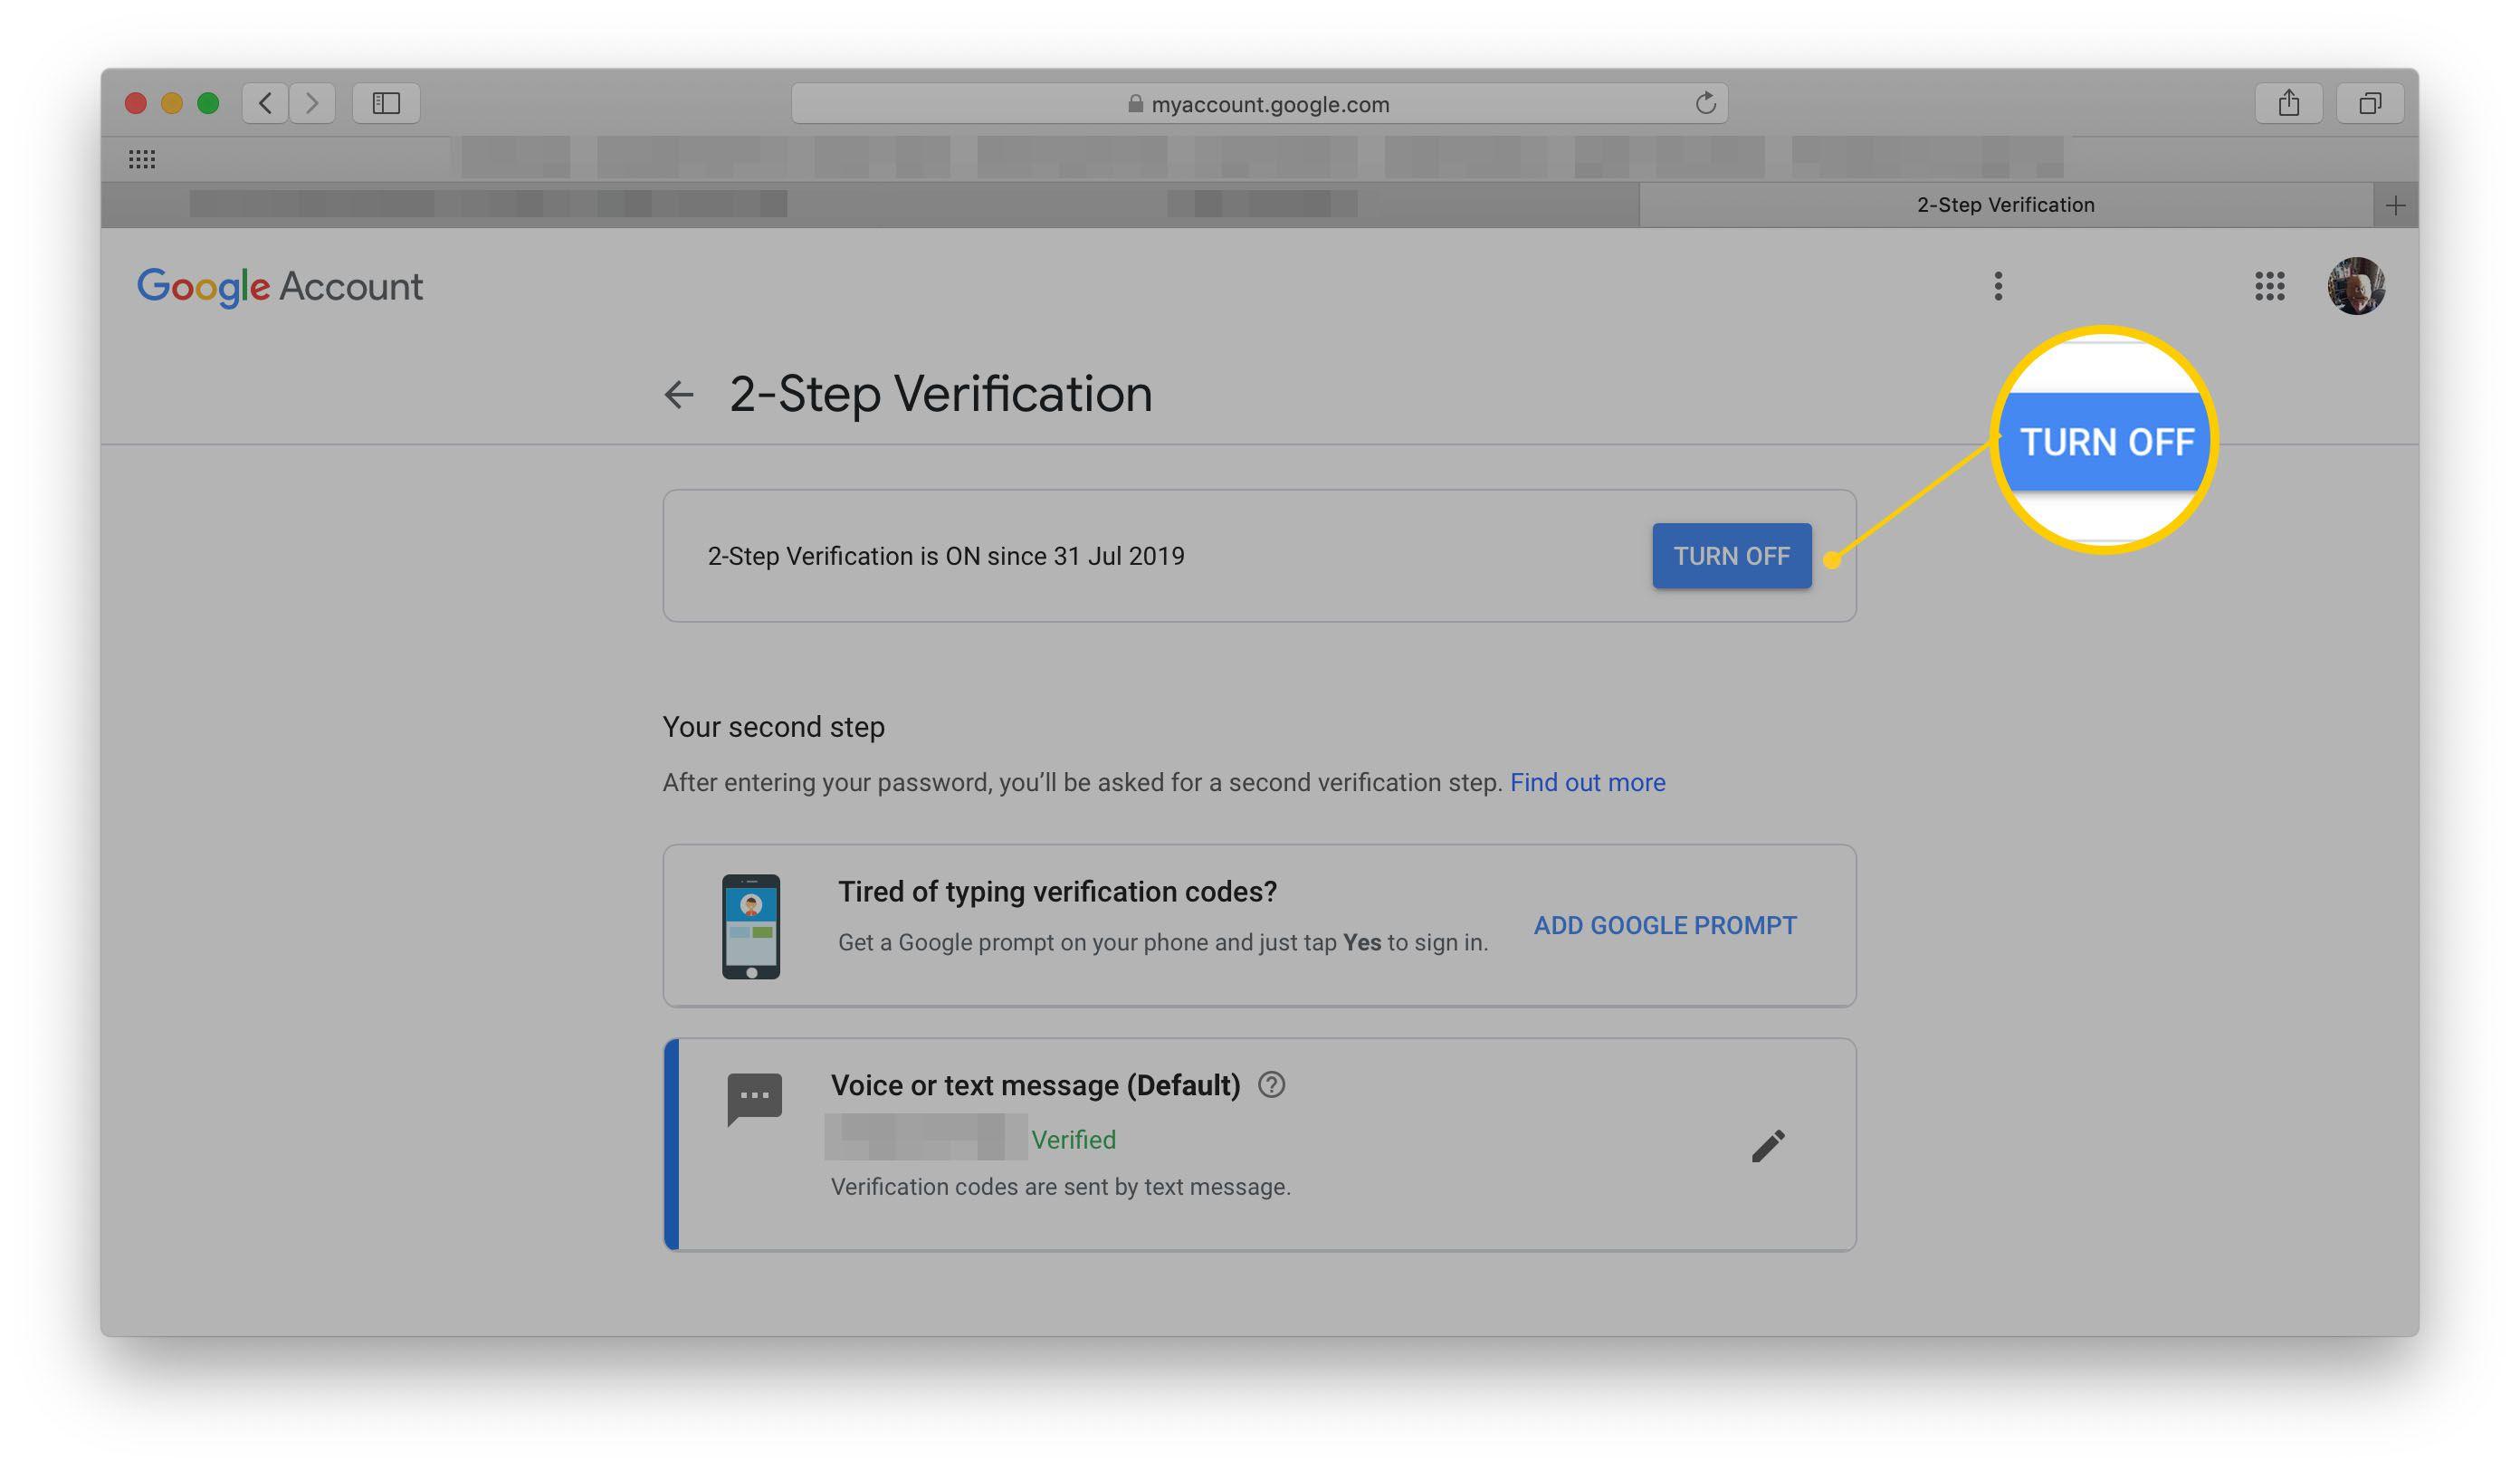 Google 2-Step Verification Turn Off page